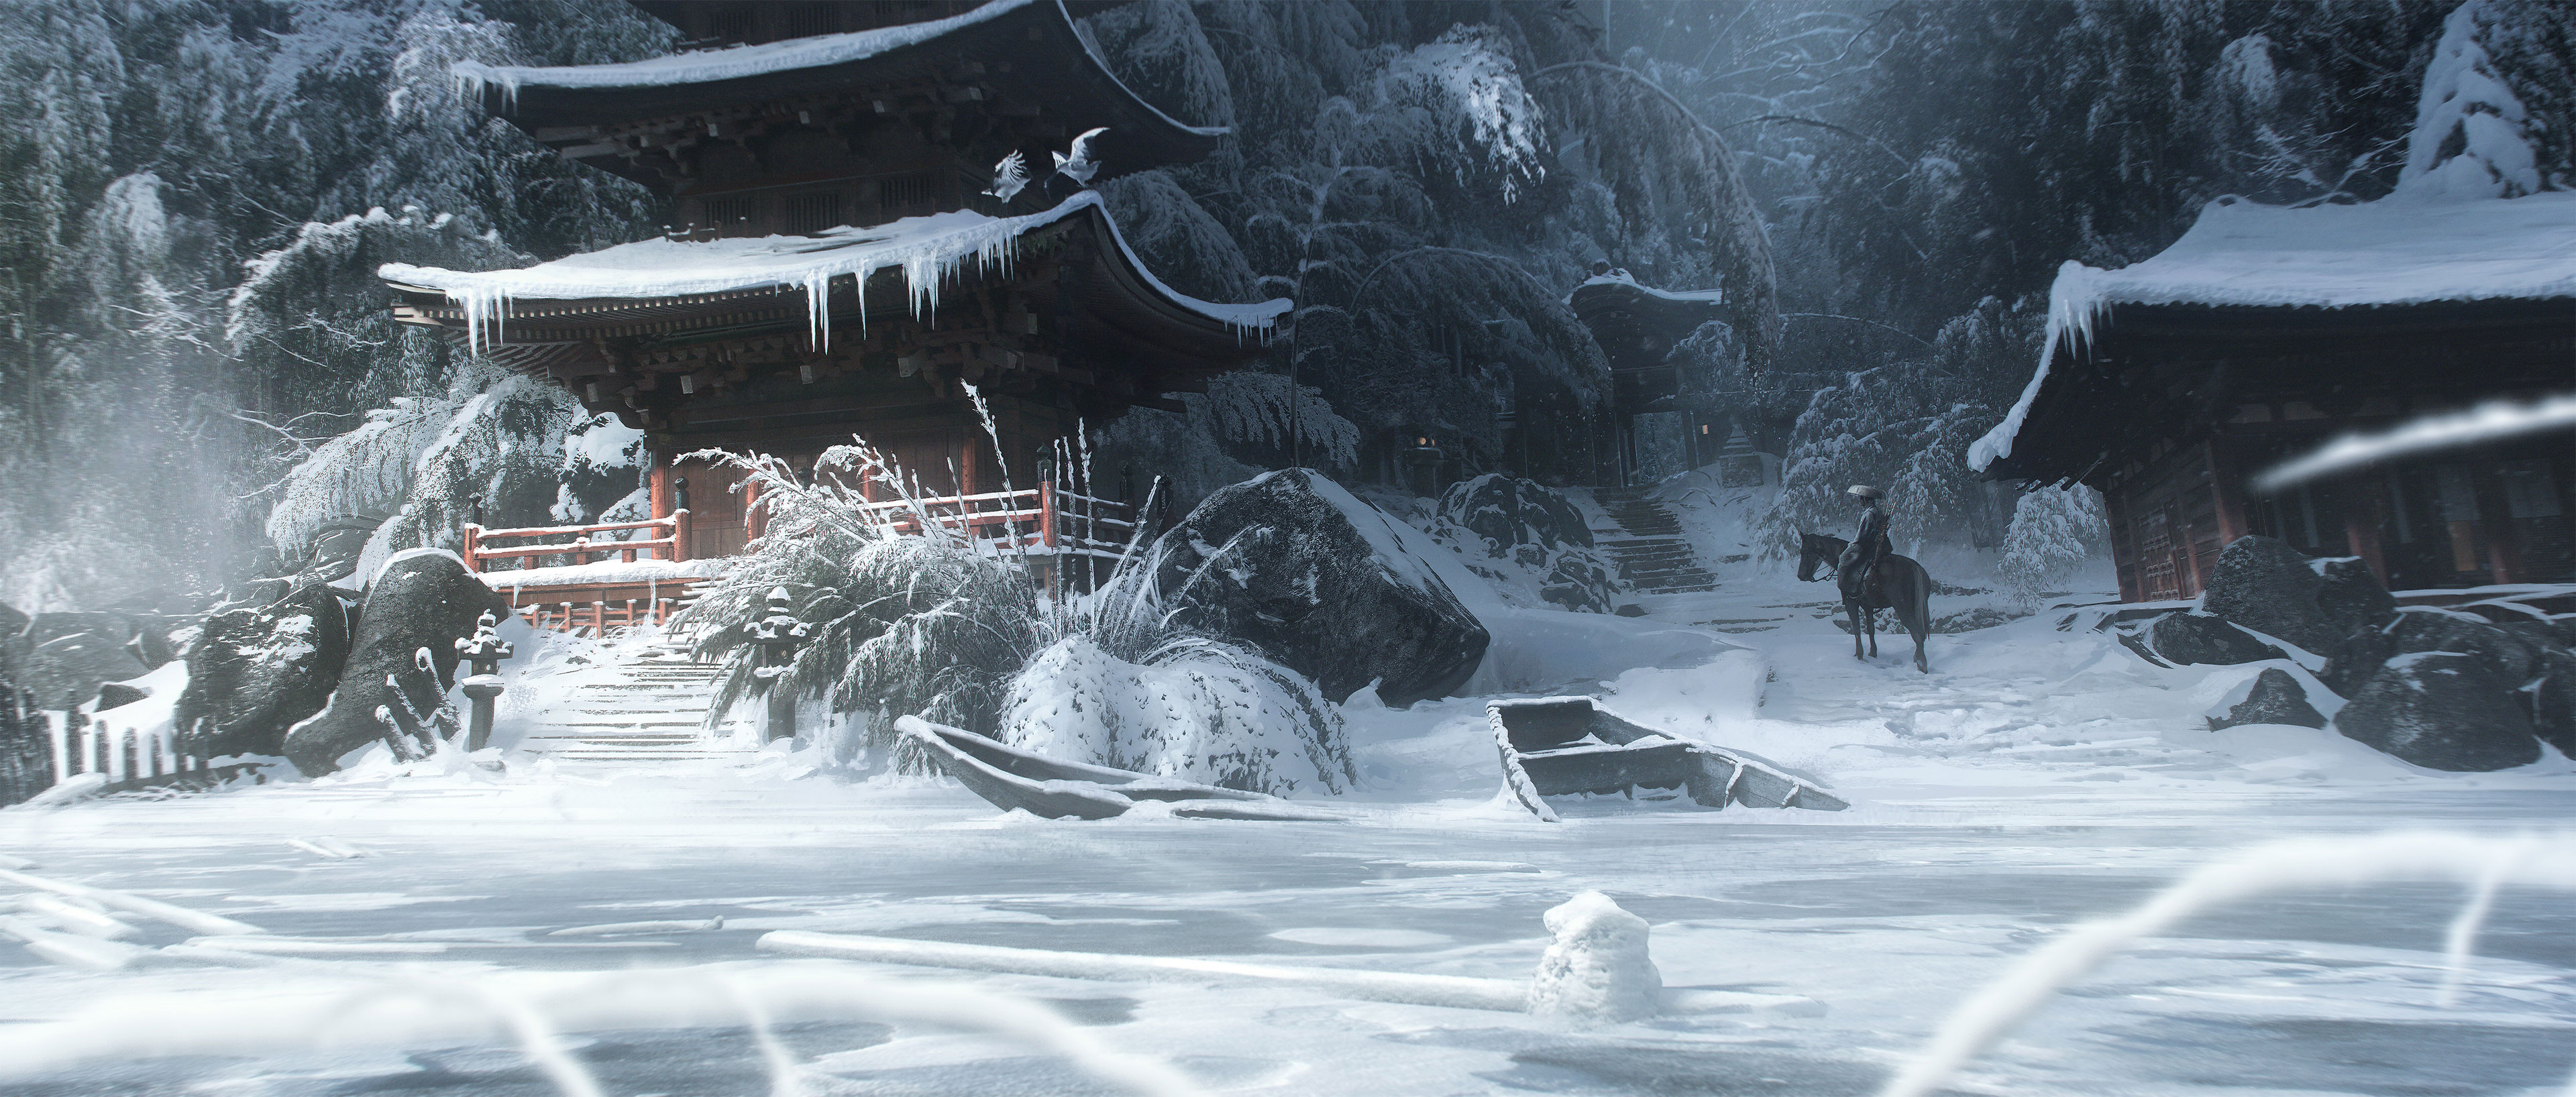 GhostofTsushima PS4 Editeur 008